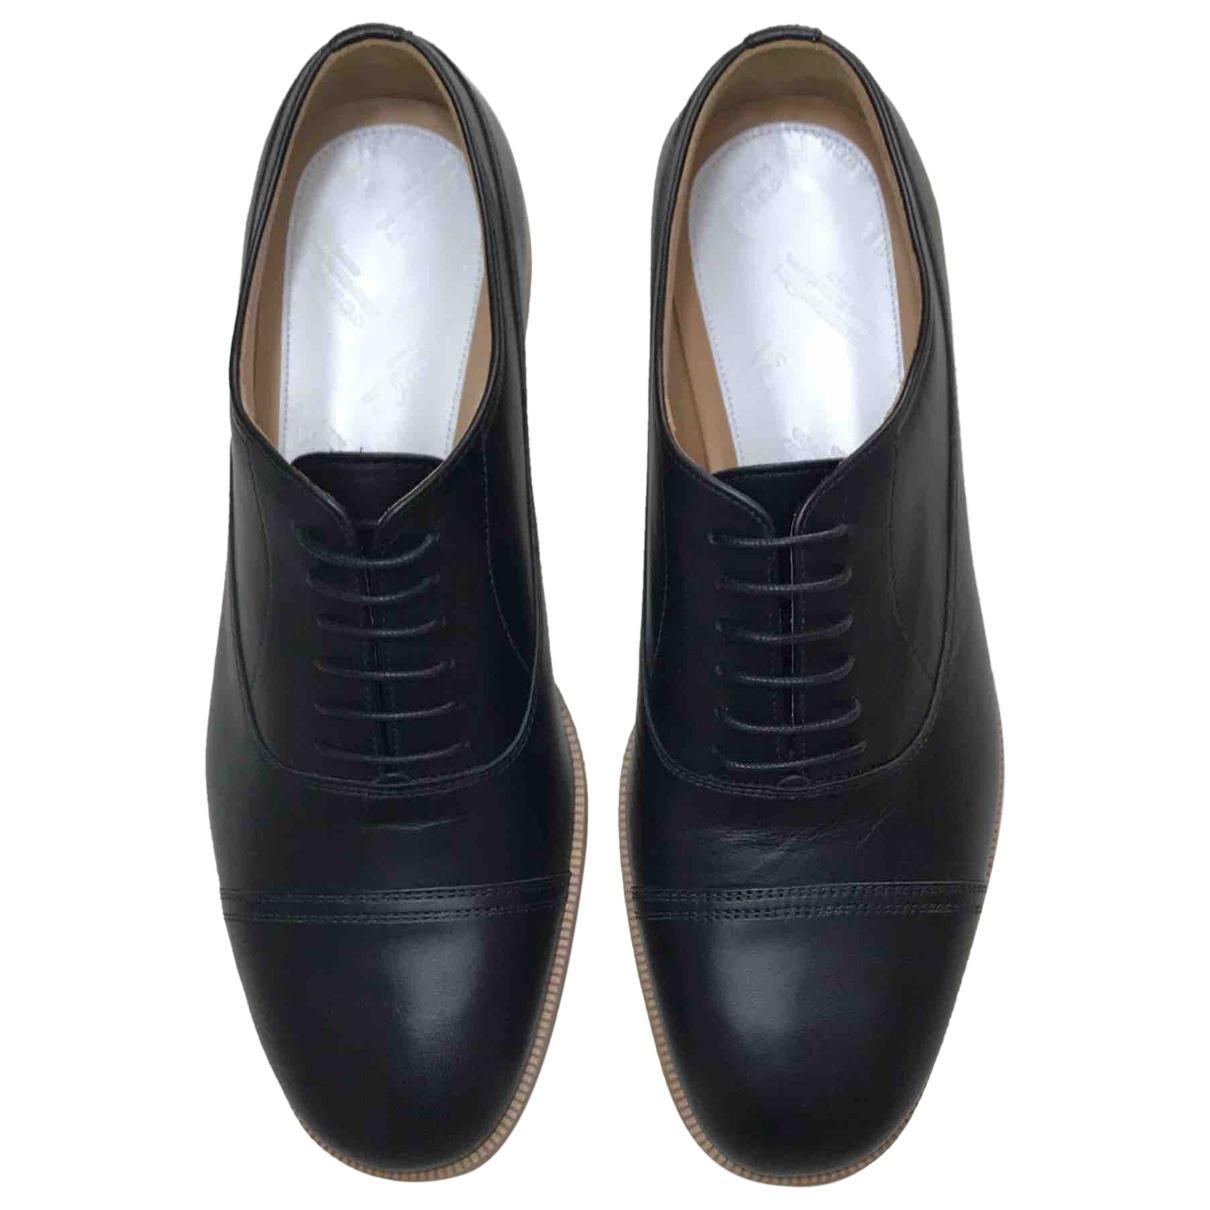 Pre-owned - Leather lace ups Maison Martin Margiela cb76yRm6